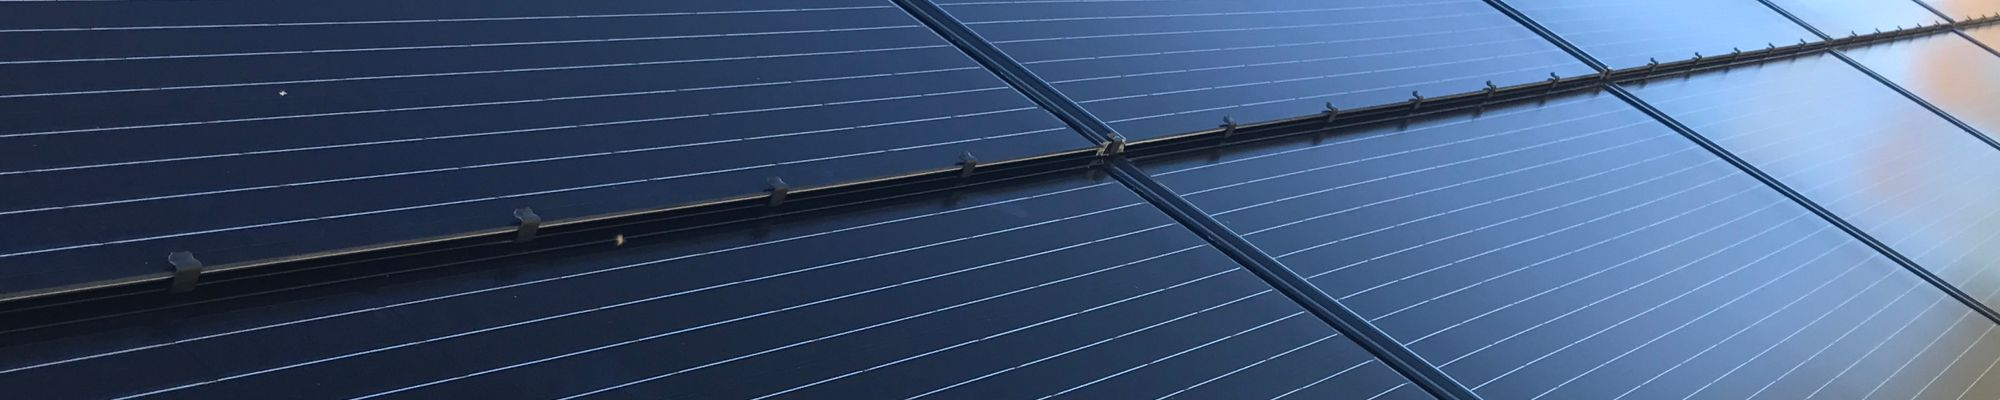 Solarmodul01